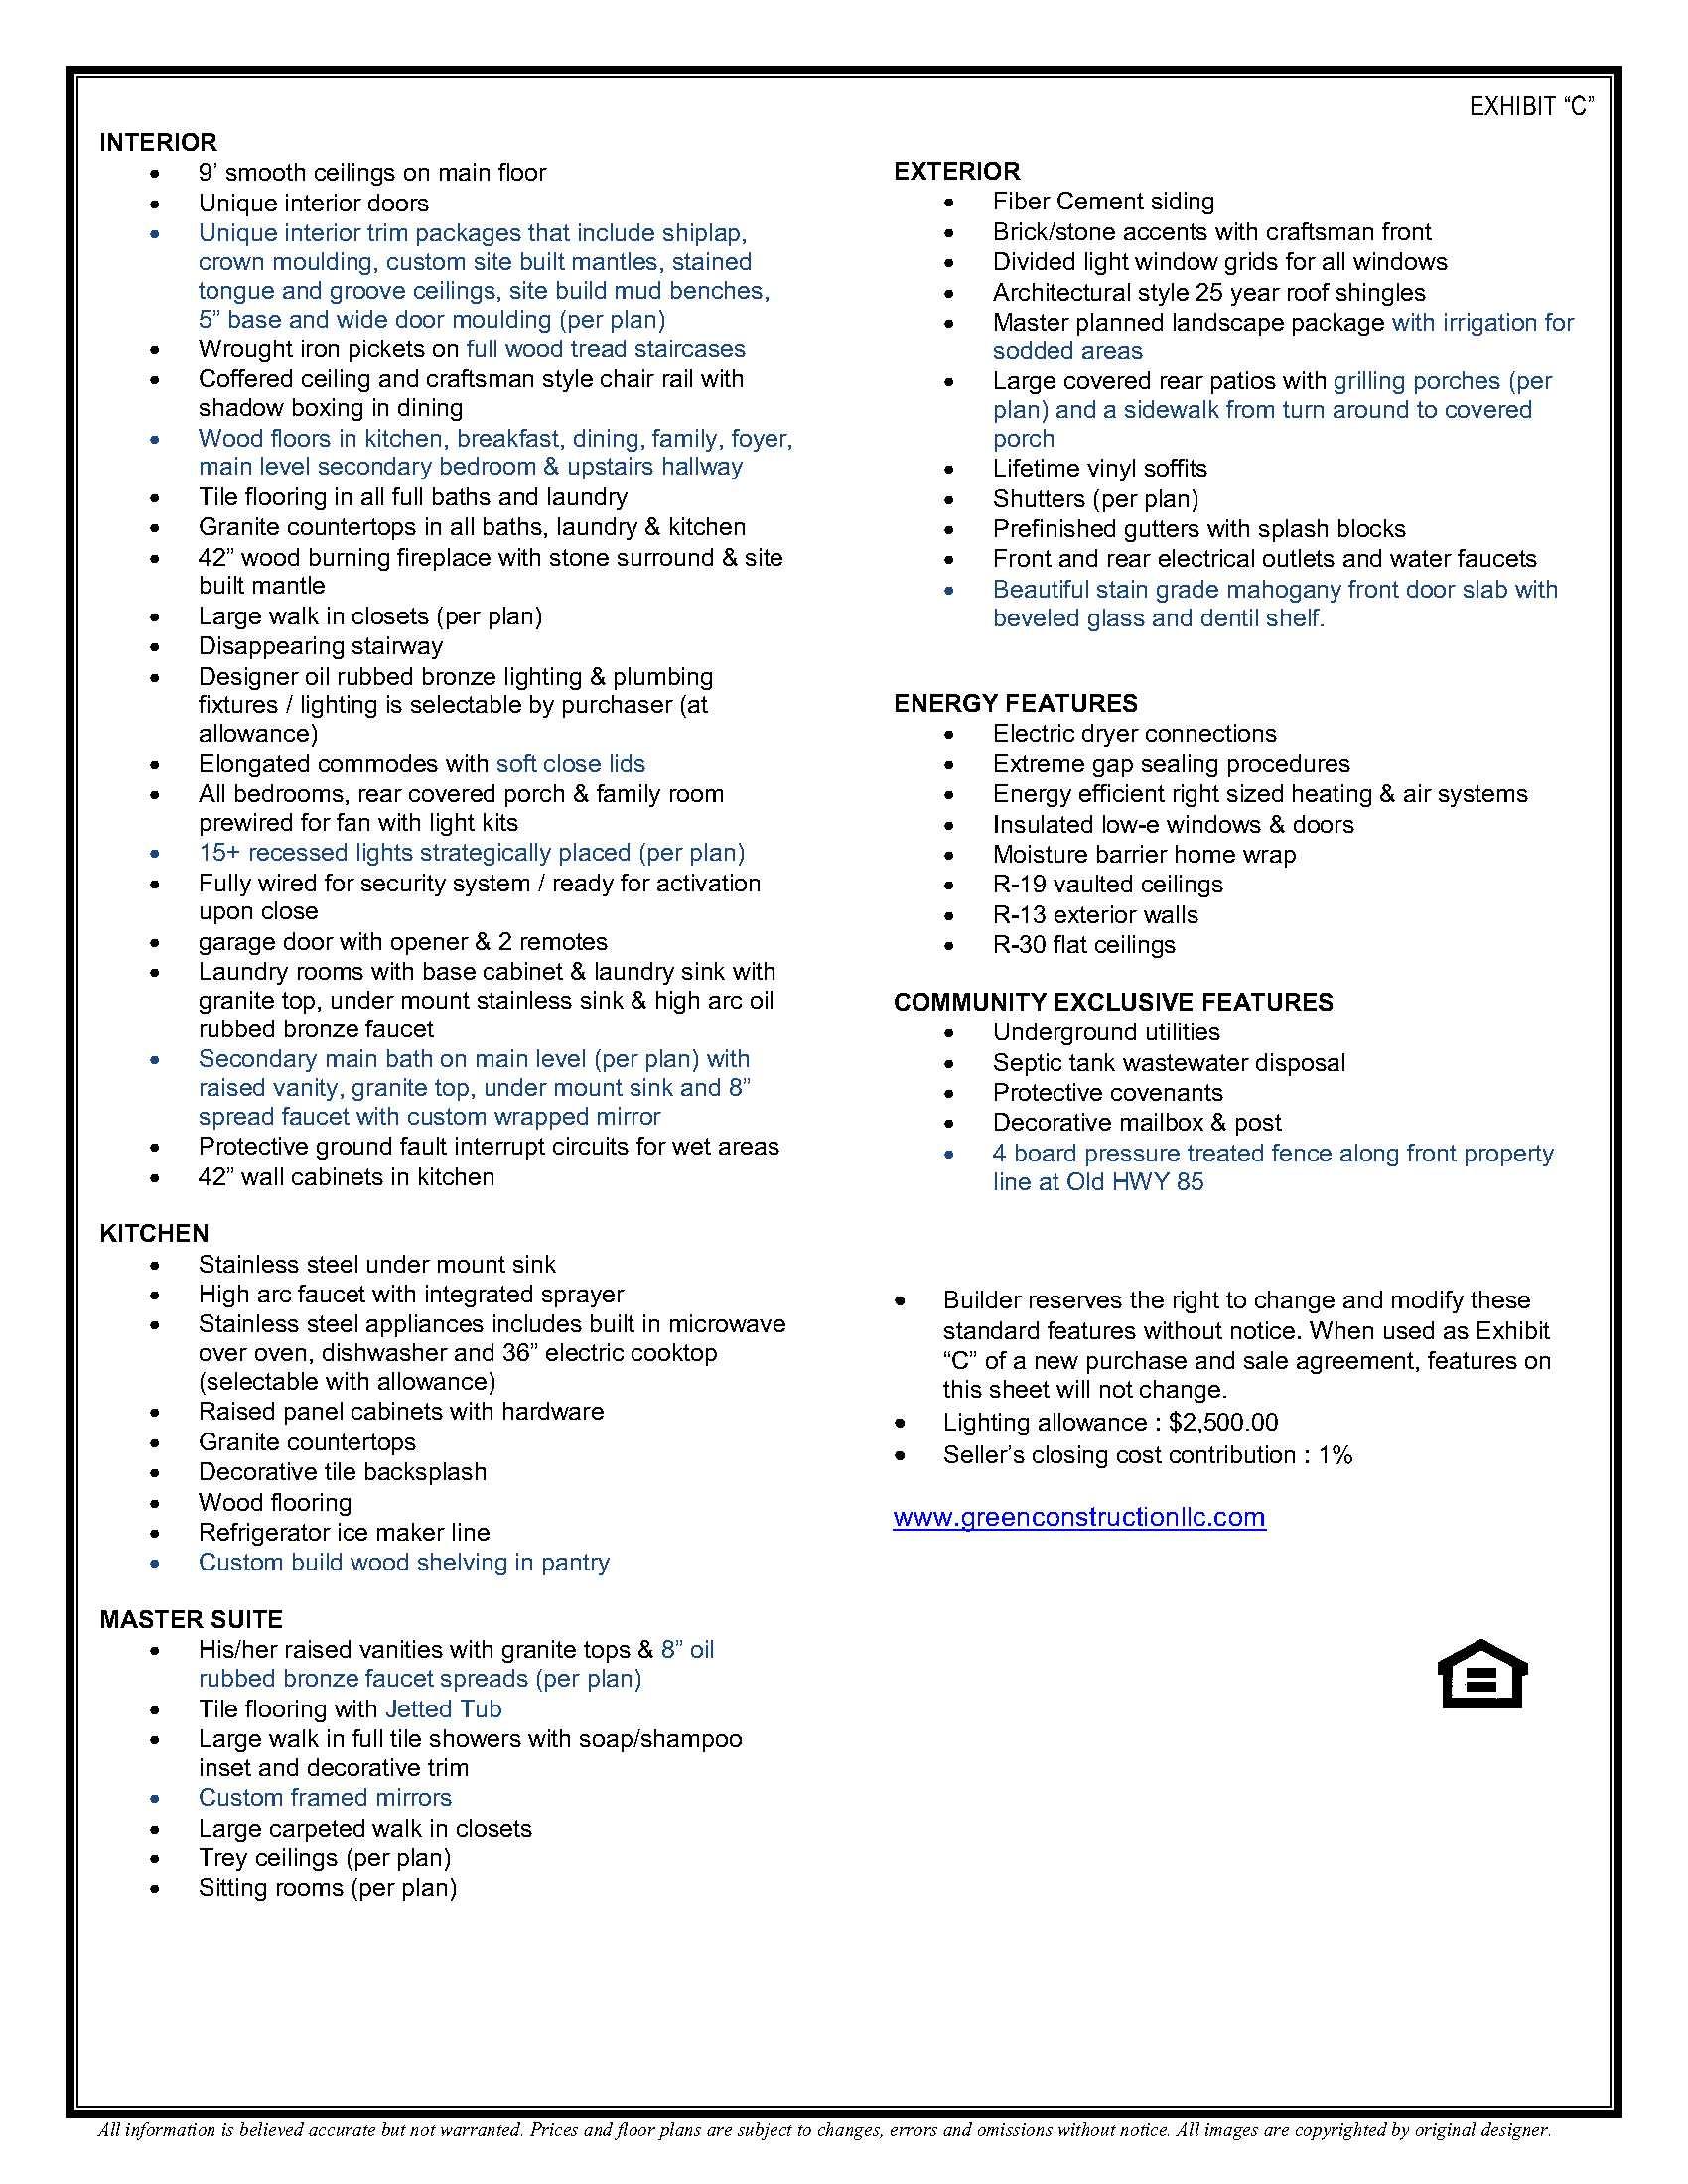 08.08.17 - Nixon Estates Standard Features.jpg